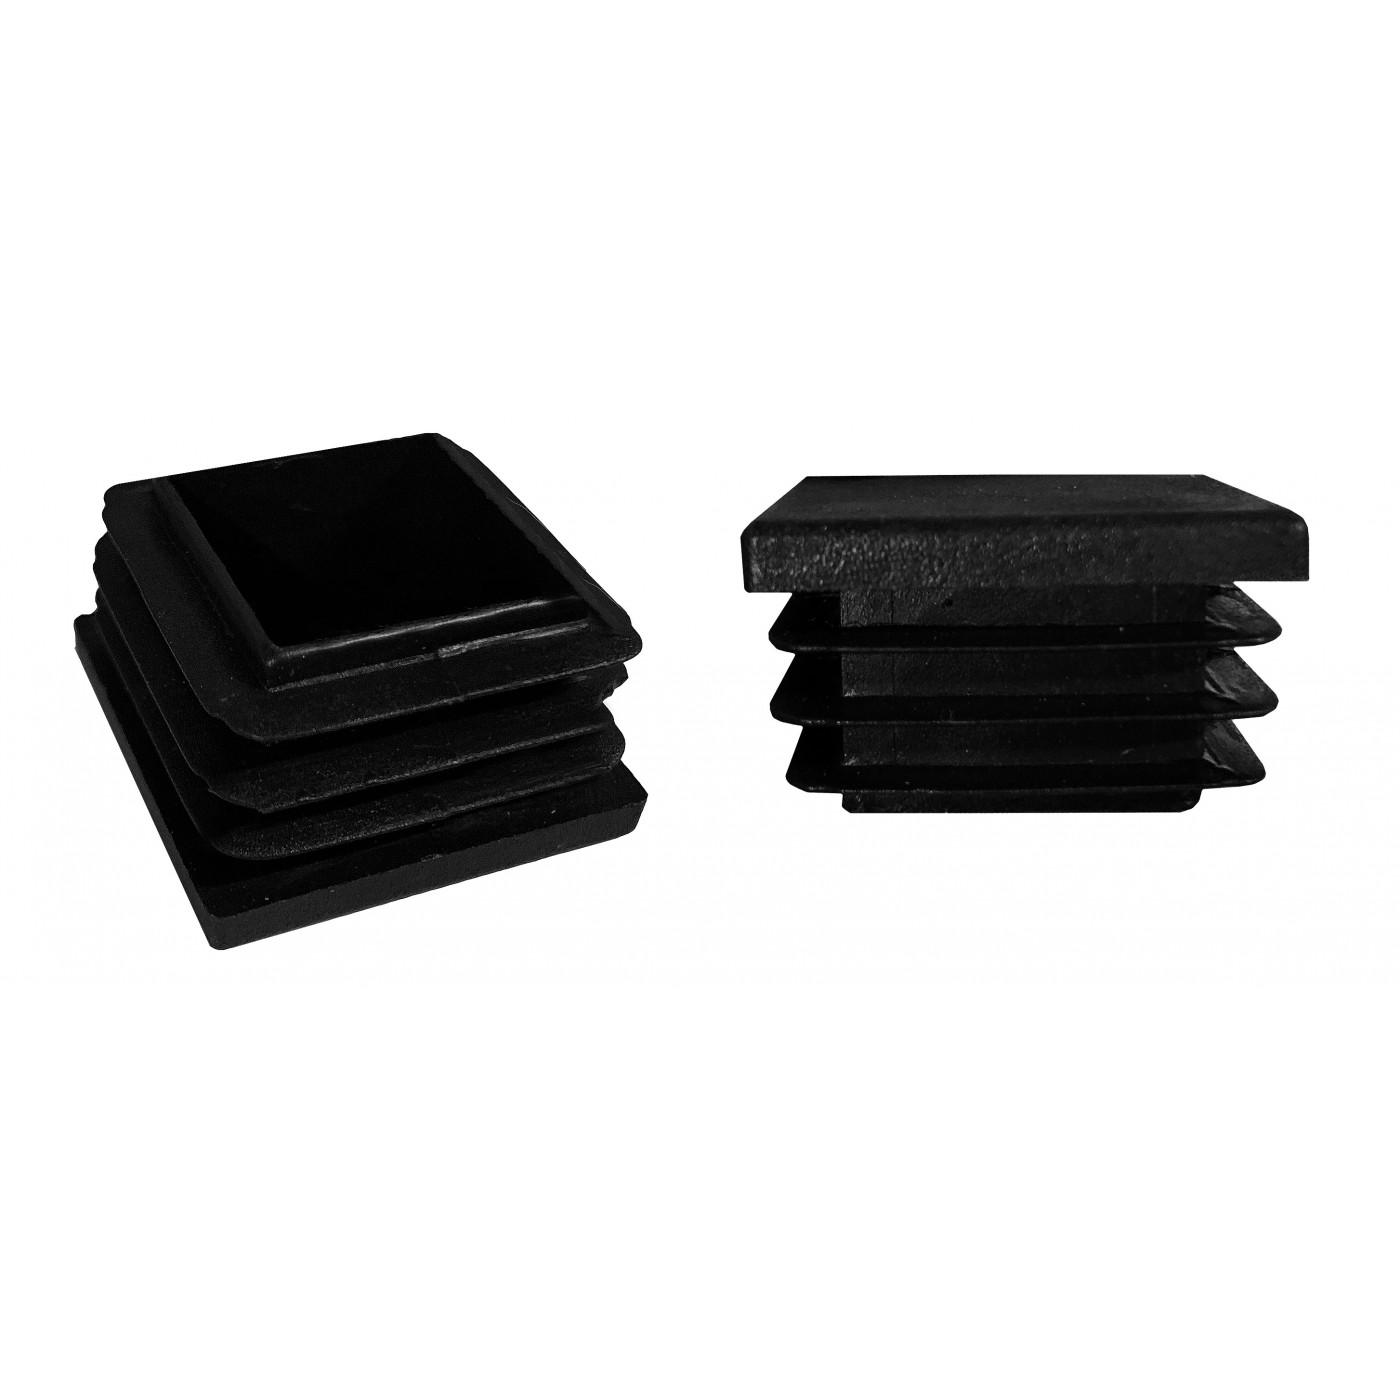 Set of 50 chair leg caps (F17/E19/D20, black)